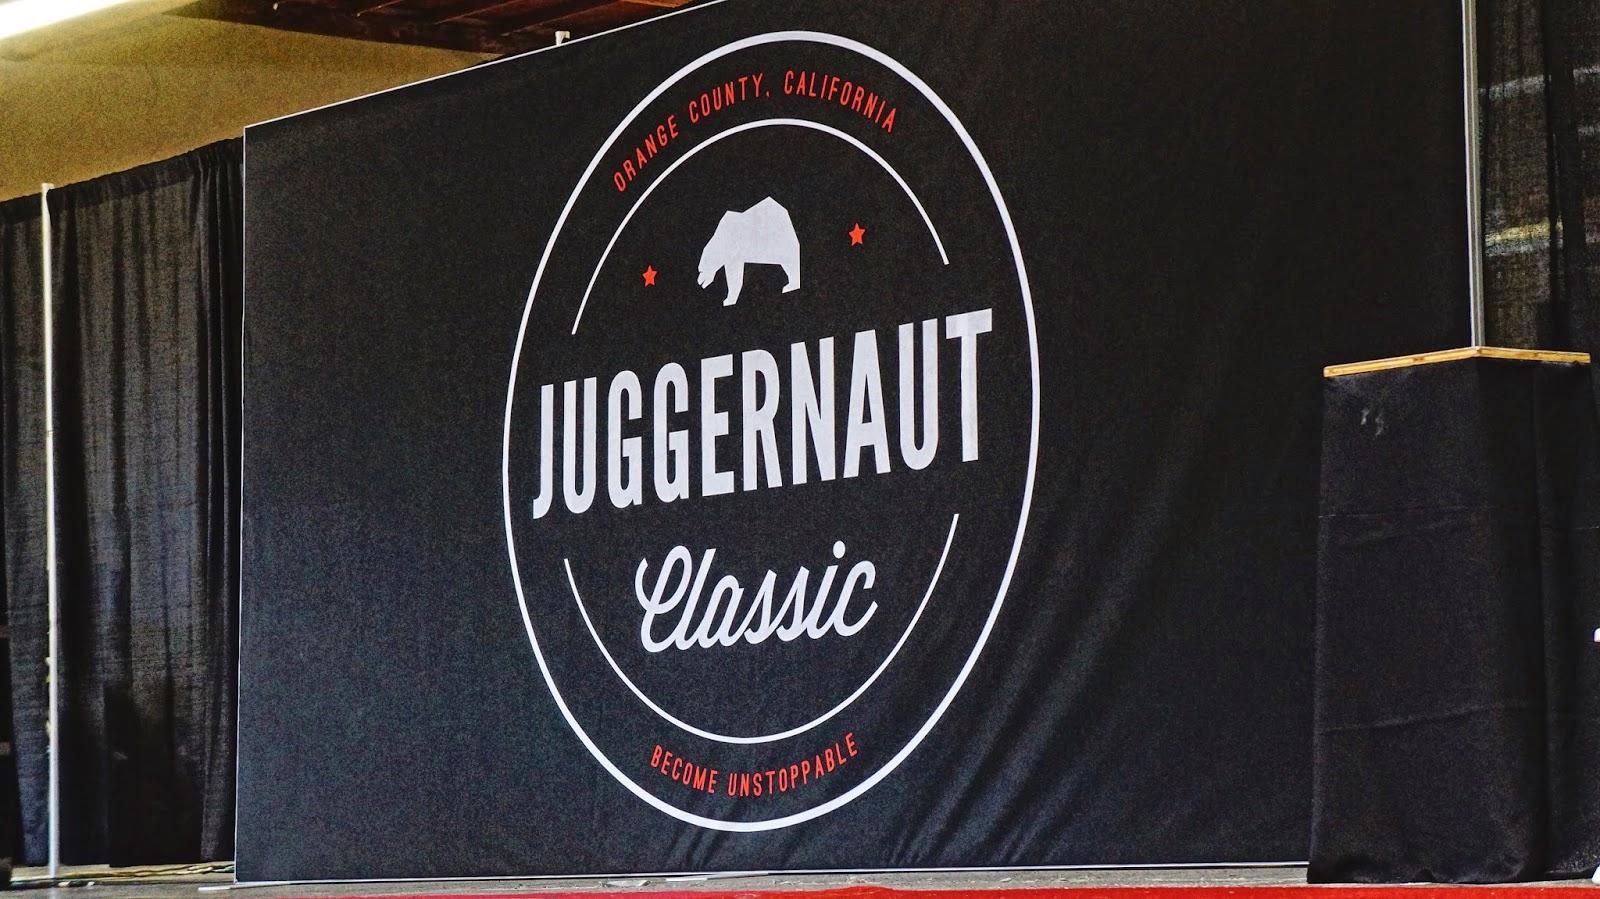 juggernaut classic